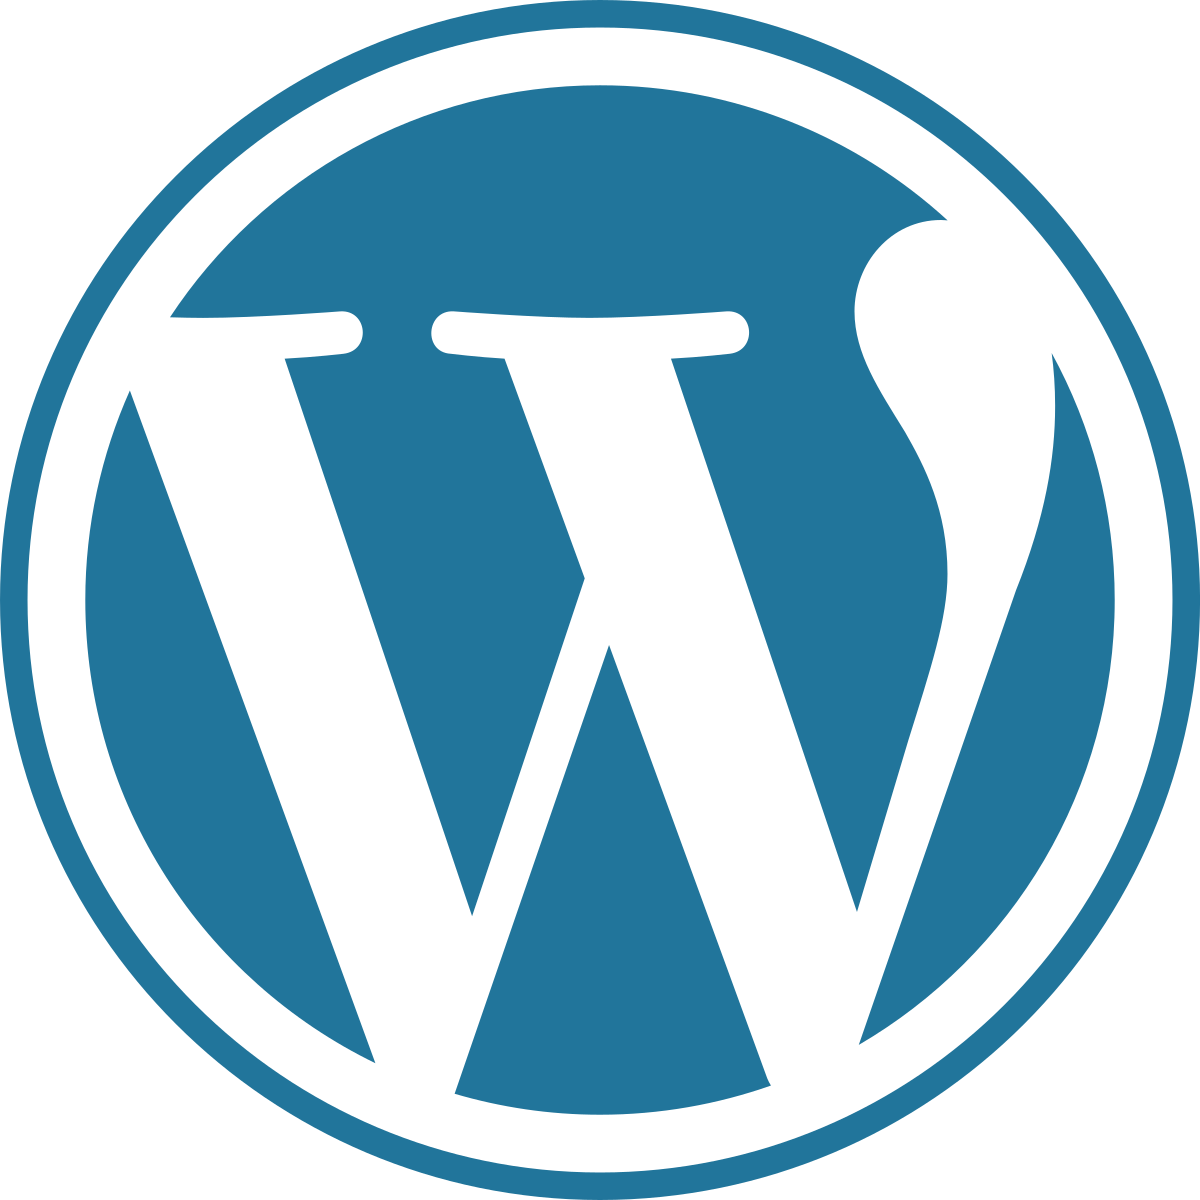 thumb_WDMyCloud_WordPress_1.03.png